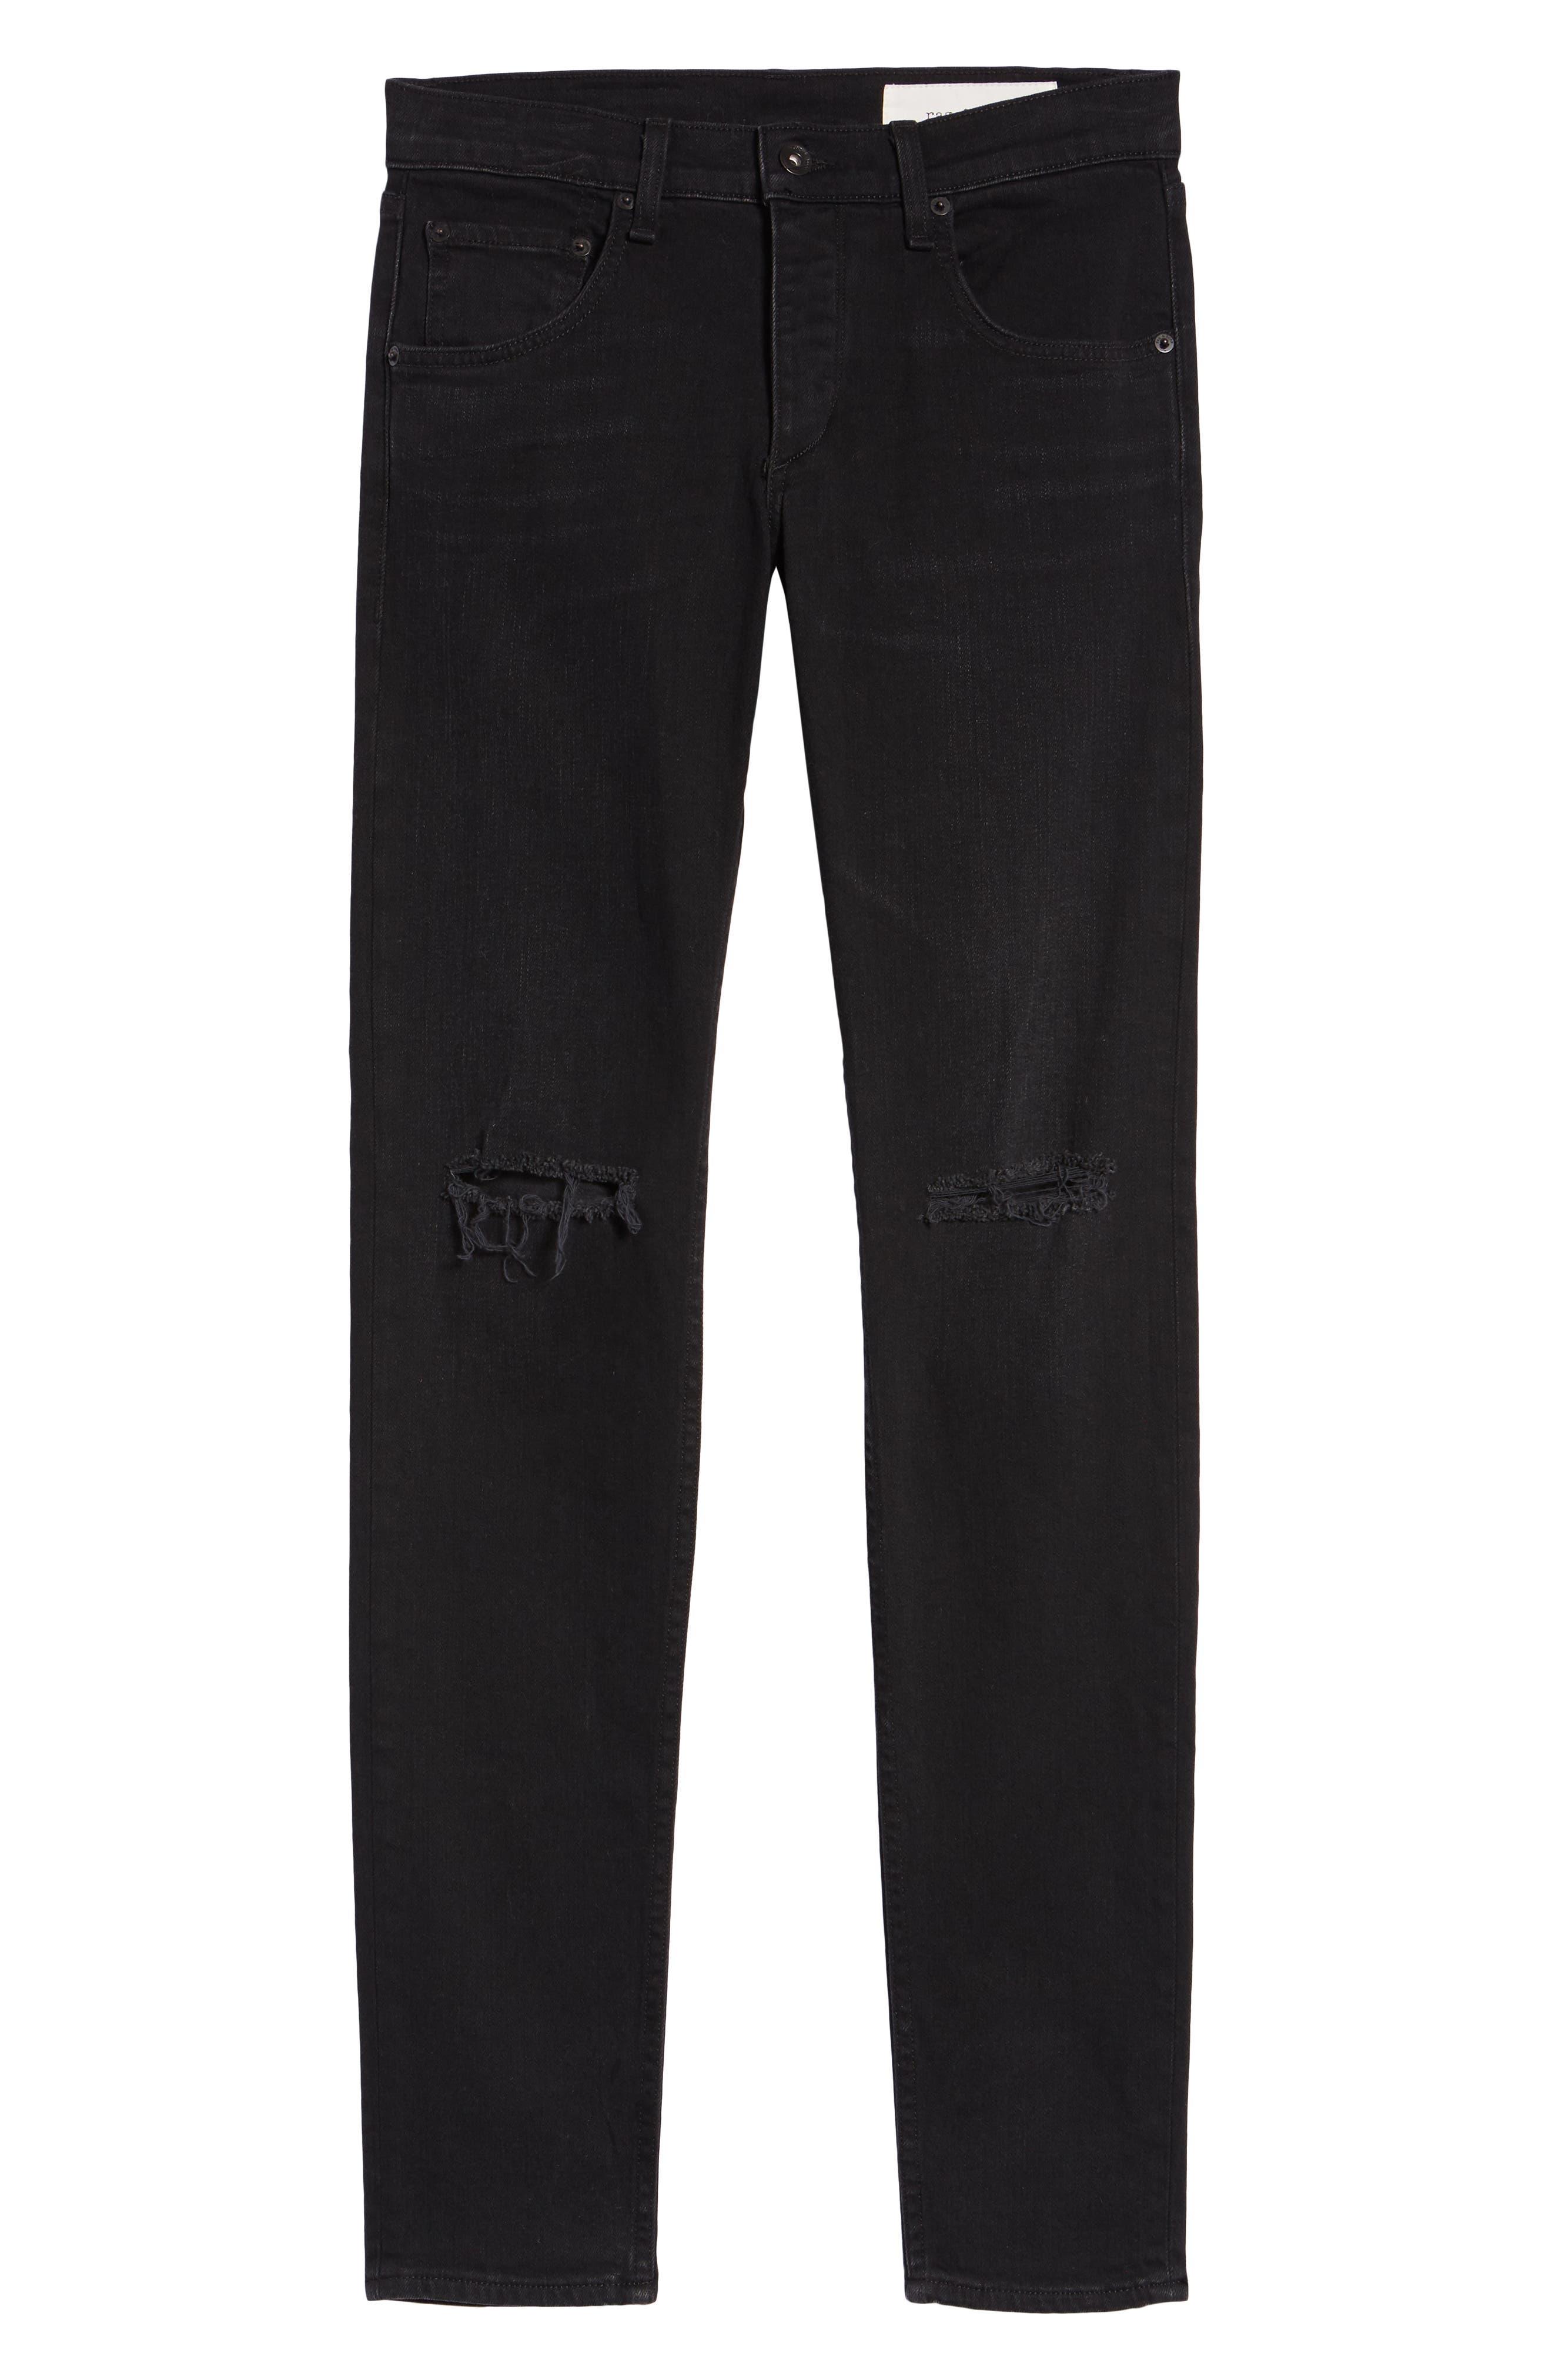 Fit 1 Skinny Fit Jeans,                             Alternate thumbnail 6, color,                             BLACK